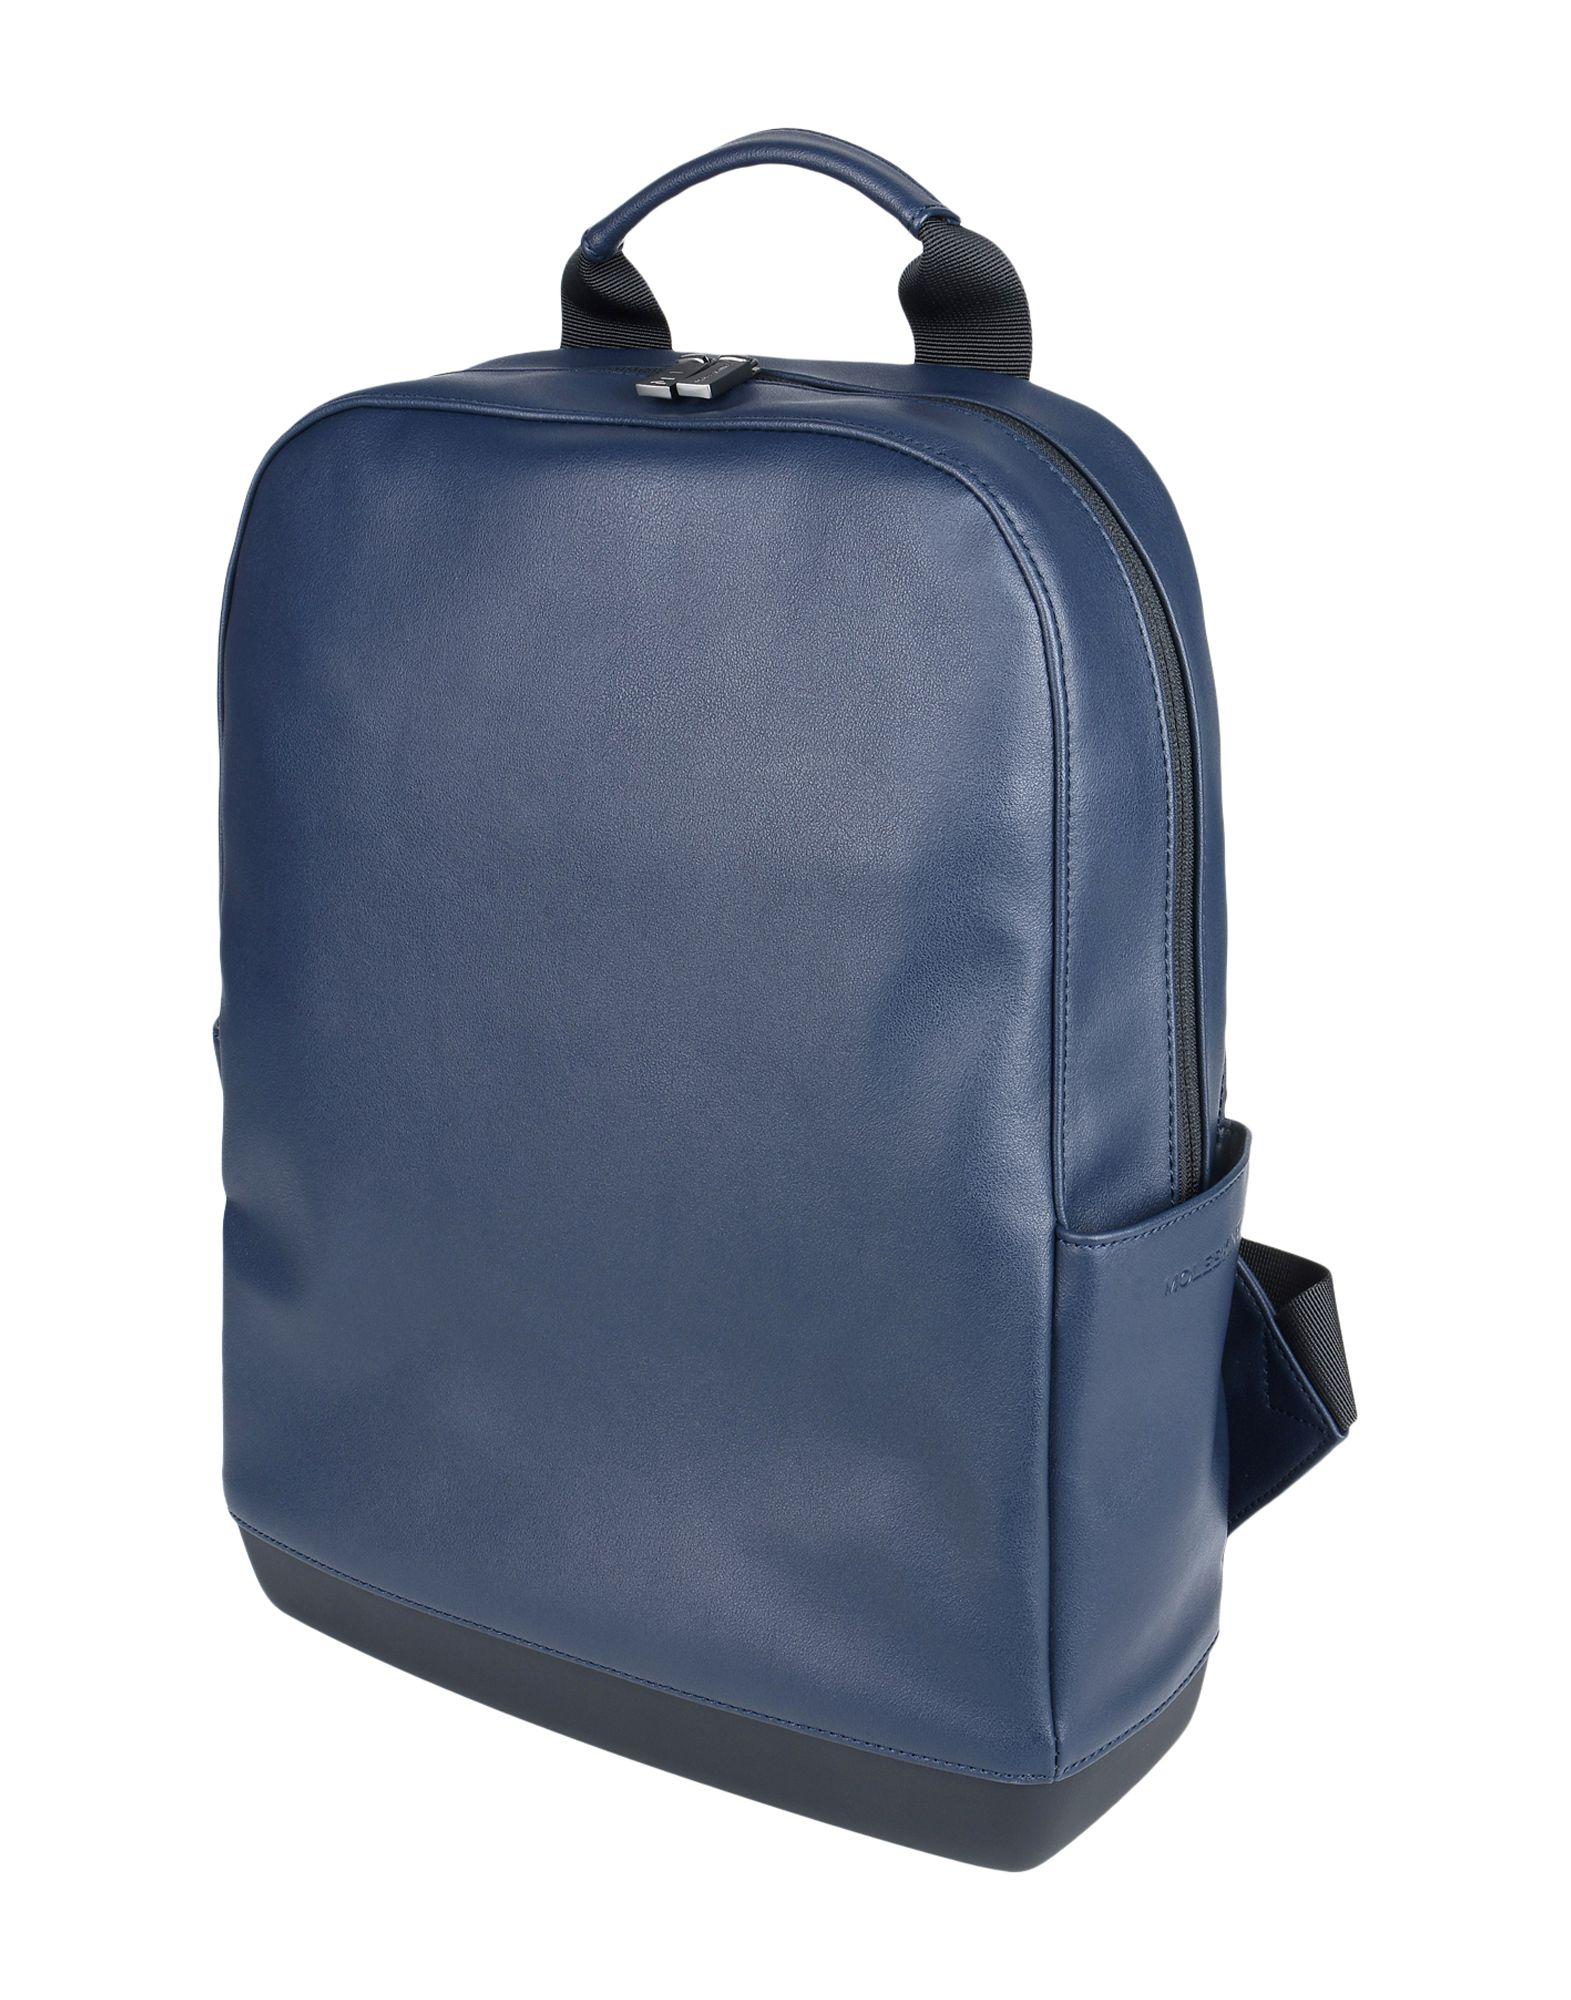 Zaini & Marsupi Moleskine Classic Backpack - Uomo - Acquista online su